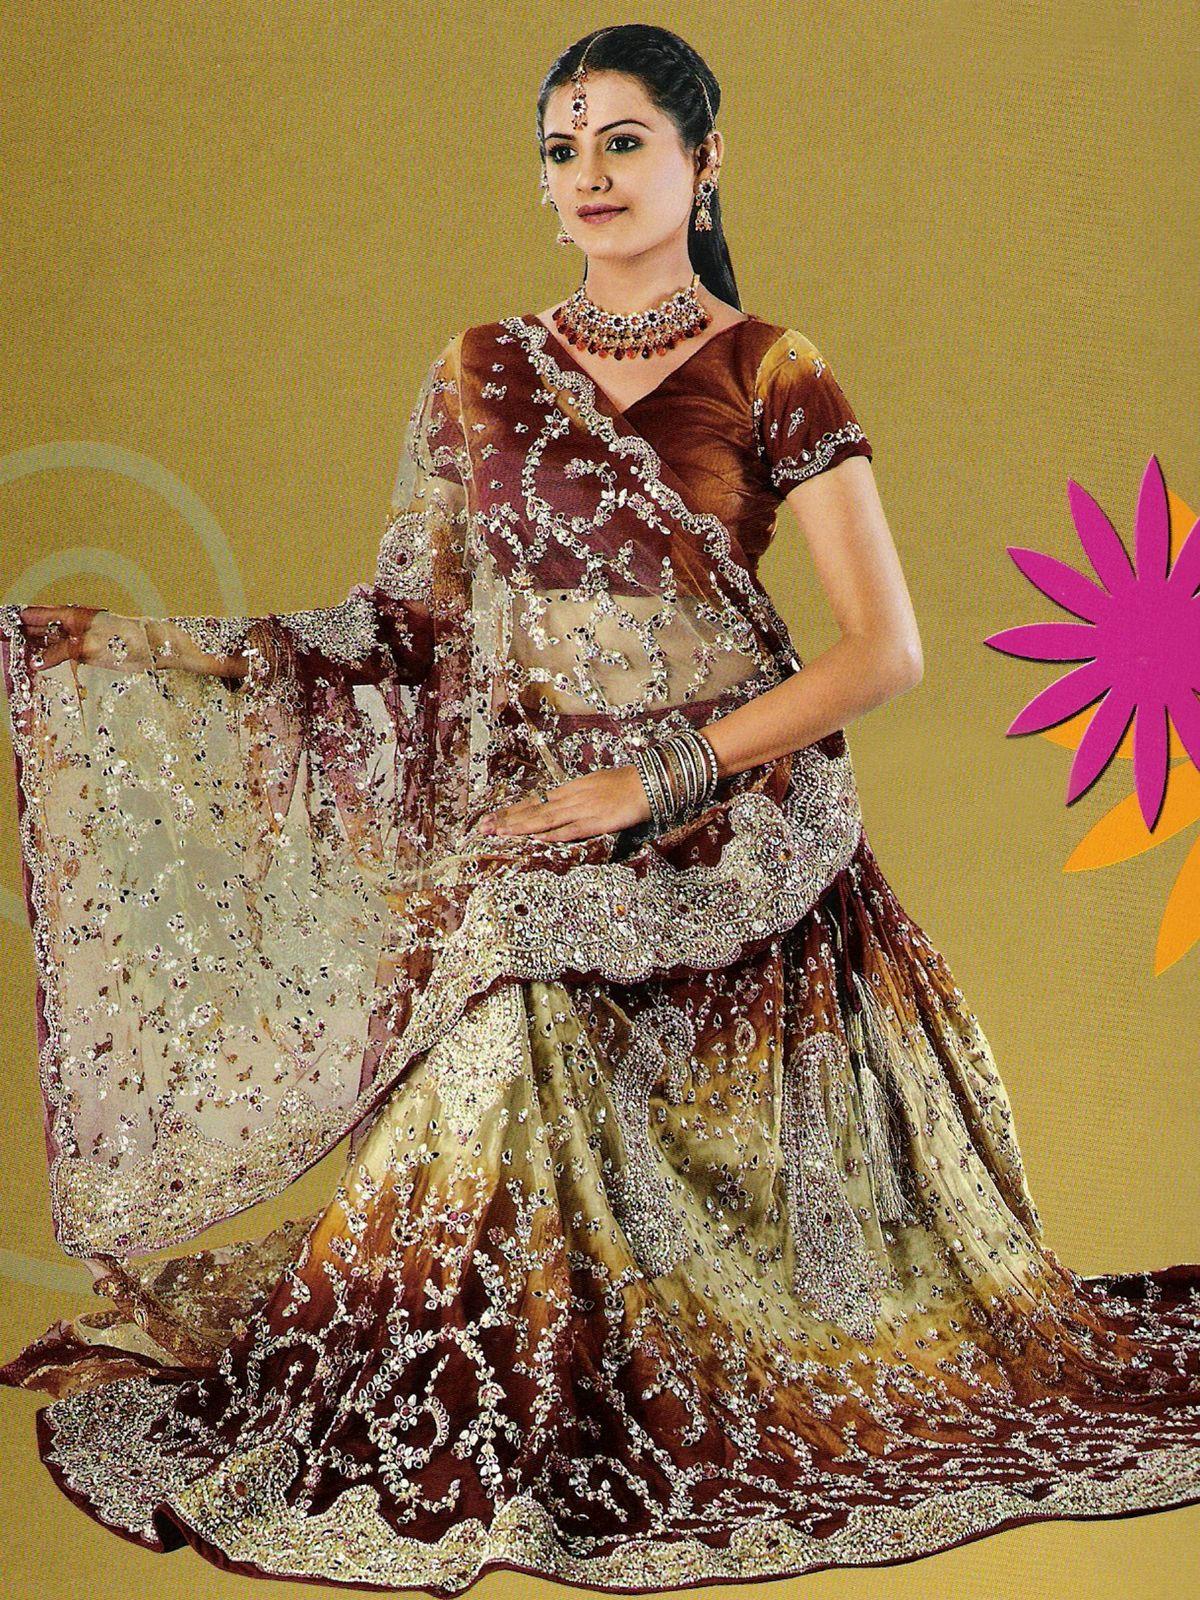 lehenga choli bridal lengha indian lenghas brown latest silver lehnga bronze ref pakistani designs bollywood saree matter pic dresses